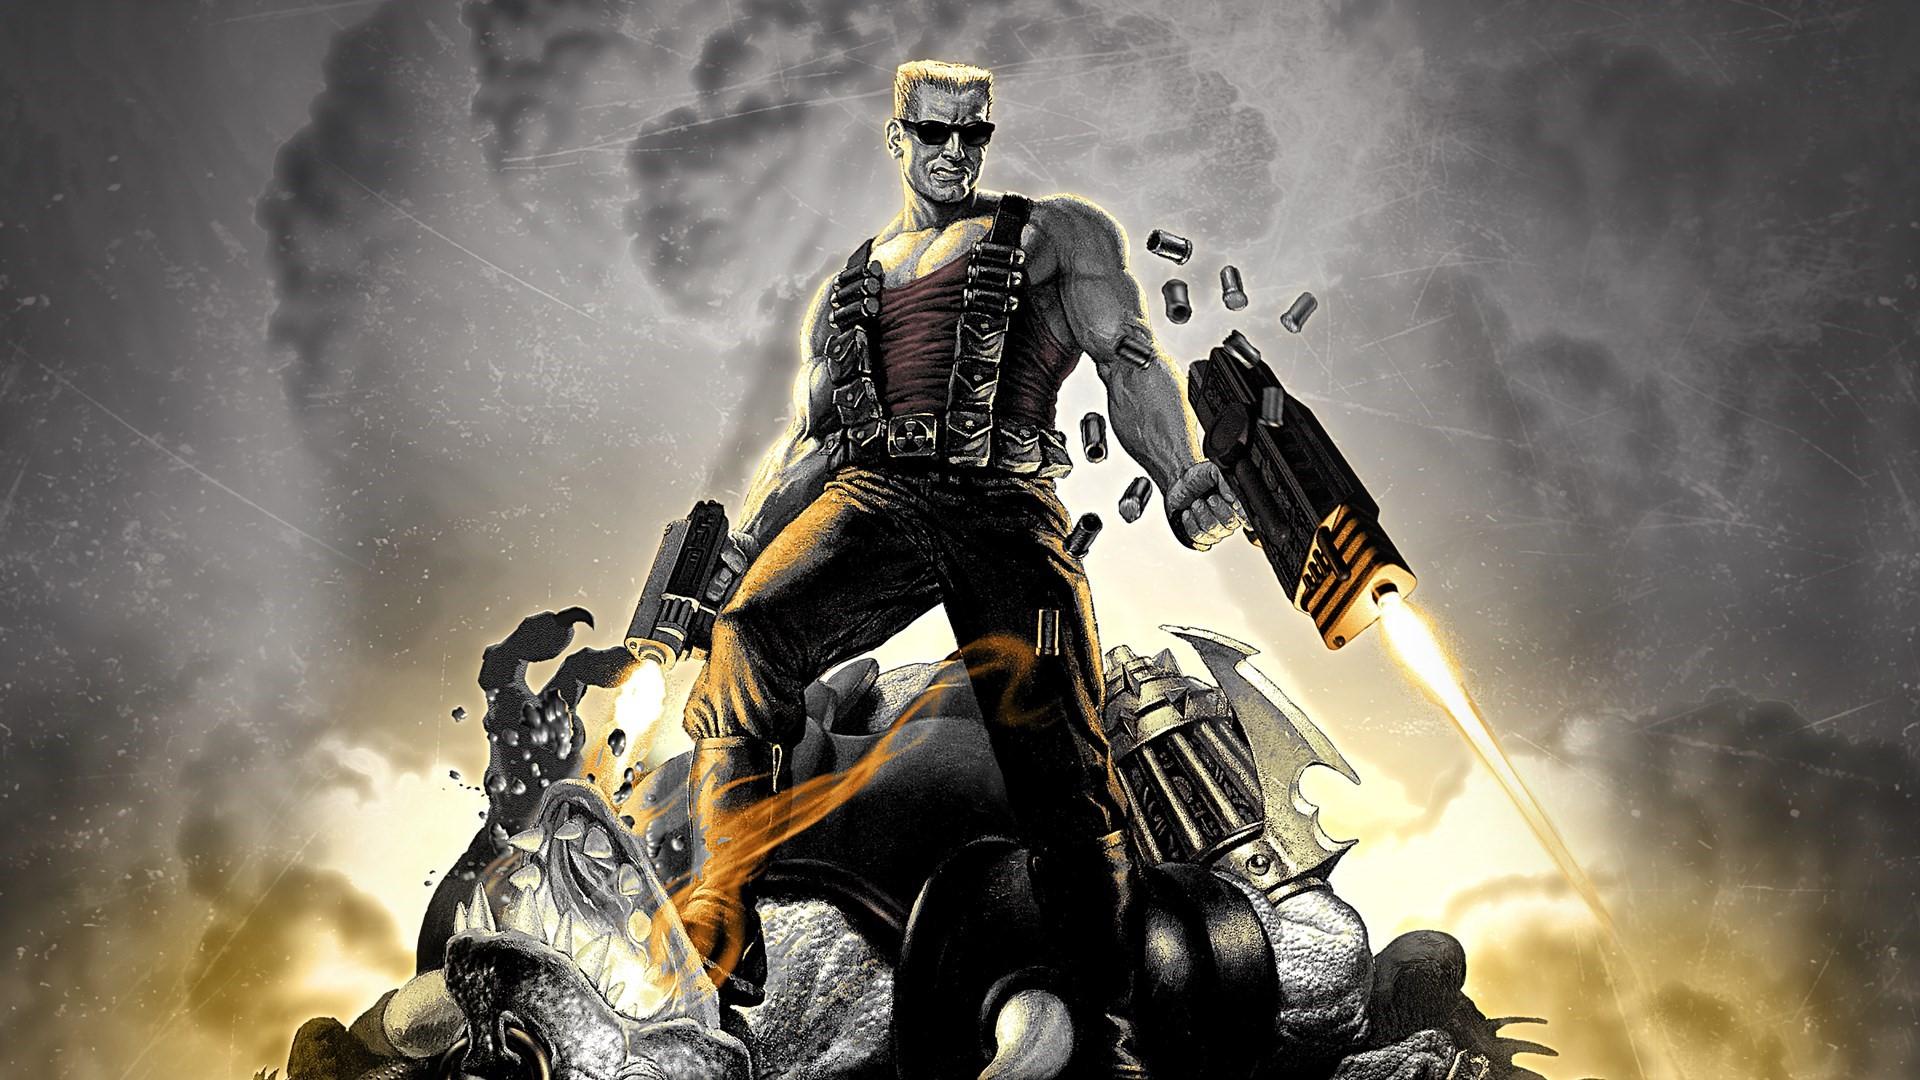 Duke Nukem - Bobby Prince, Gearbox